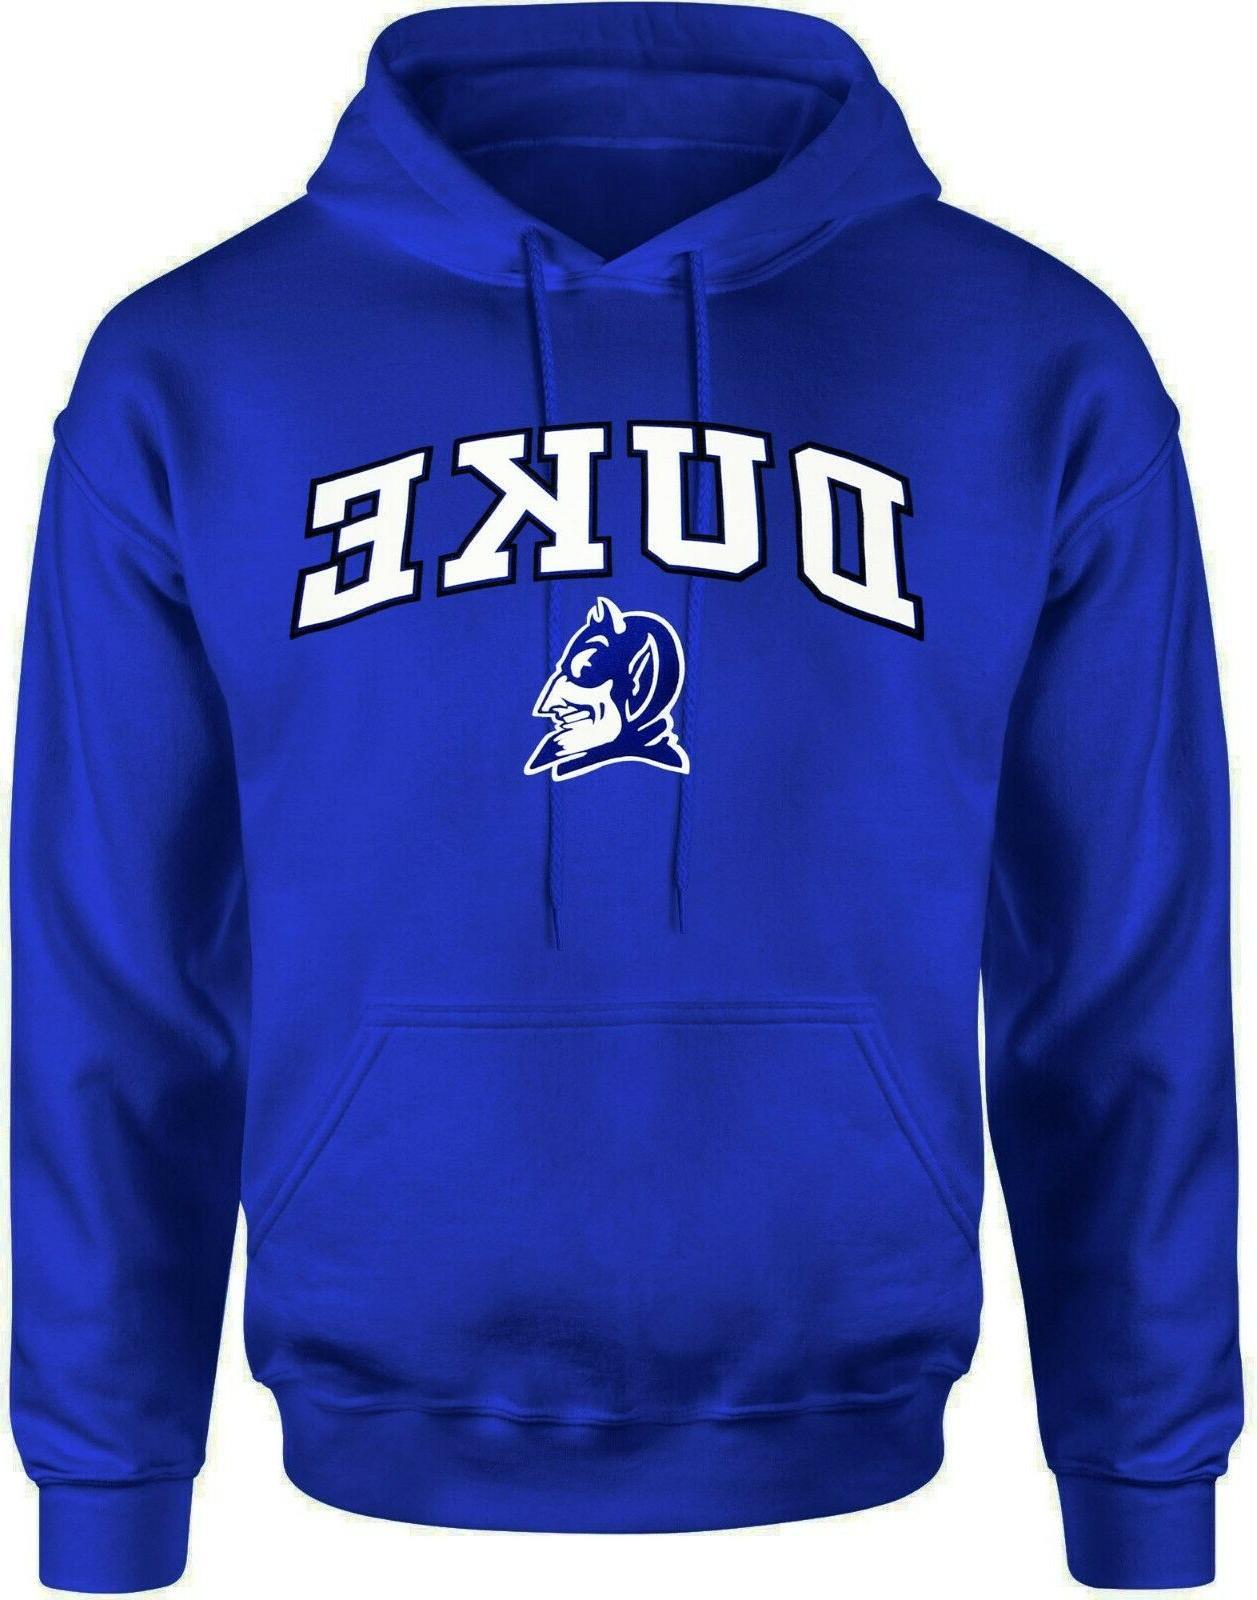 duke sweatshirt blue devils hoodie basketball womens